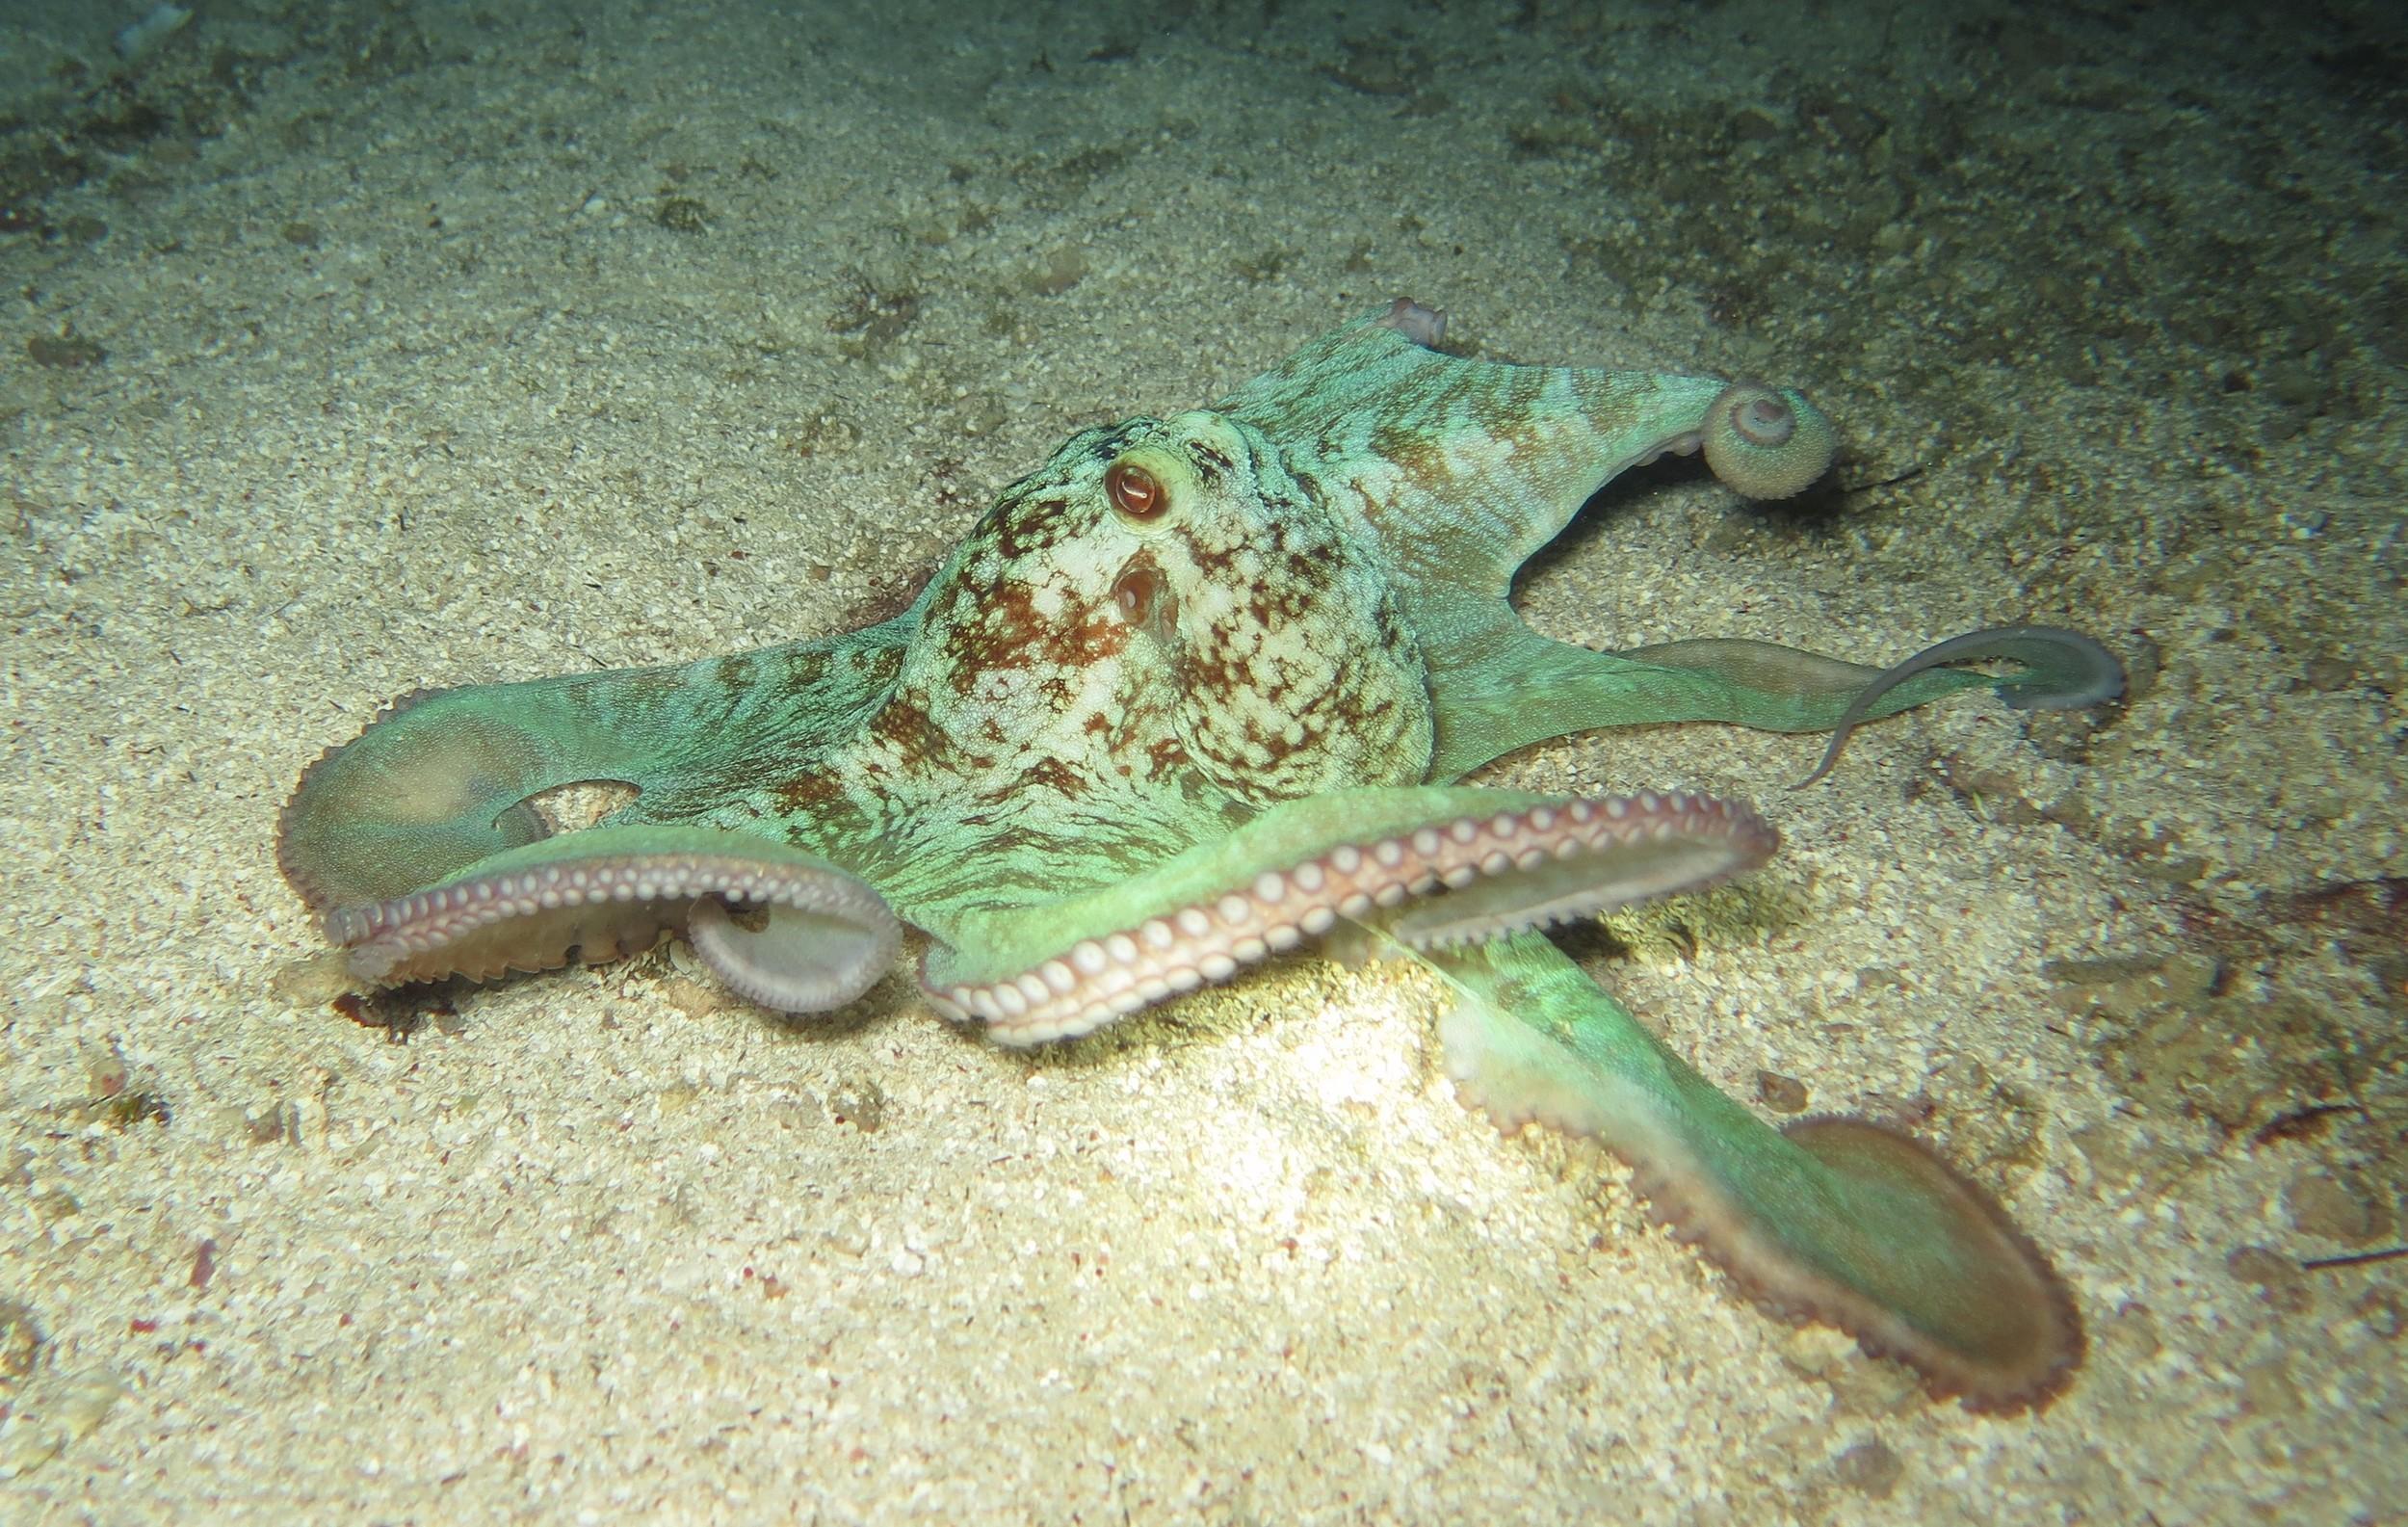 Photo - Courtney Blankenship - Caribbean Reef Octopus